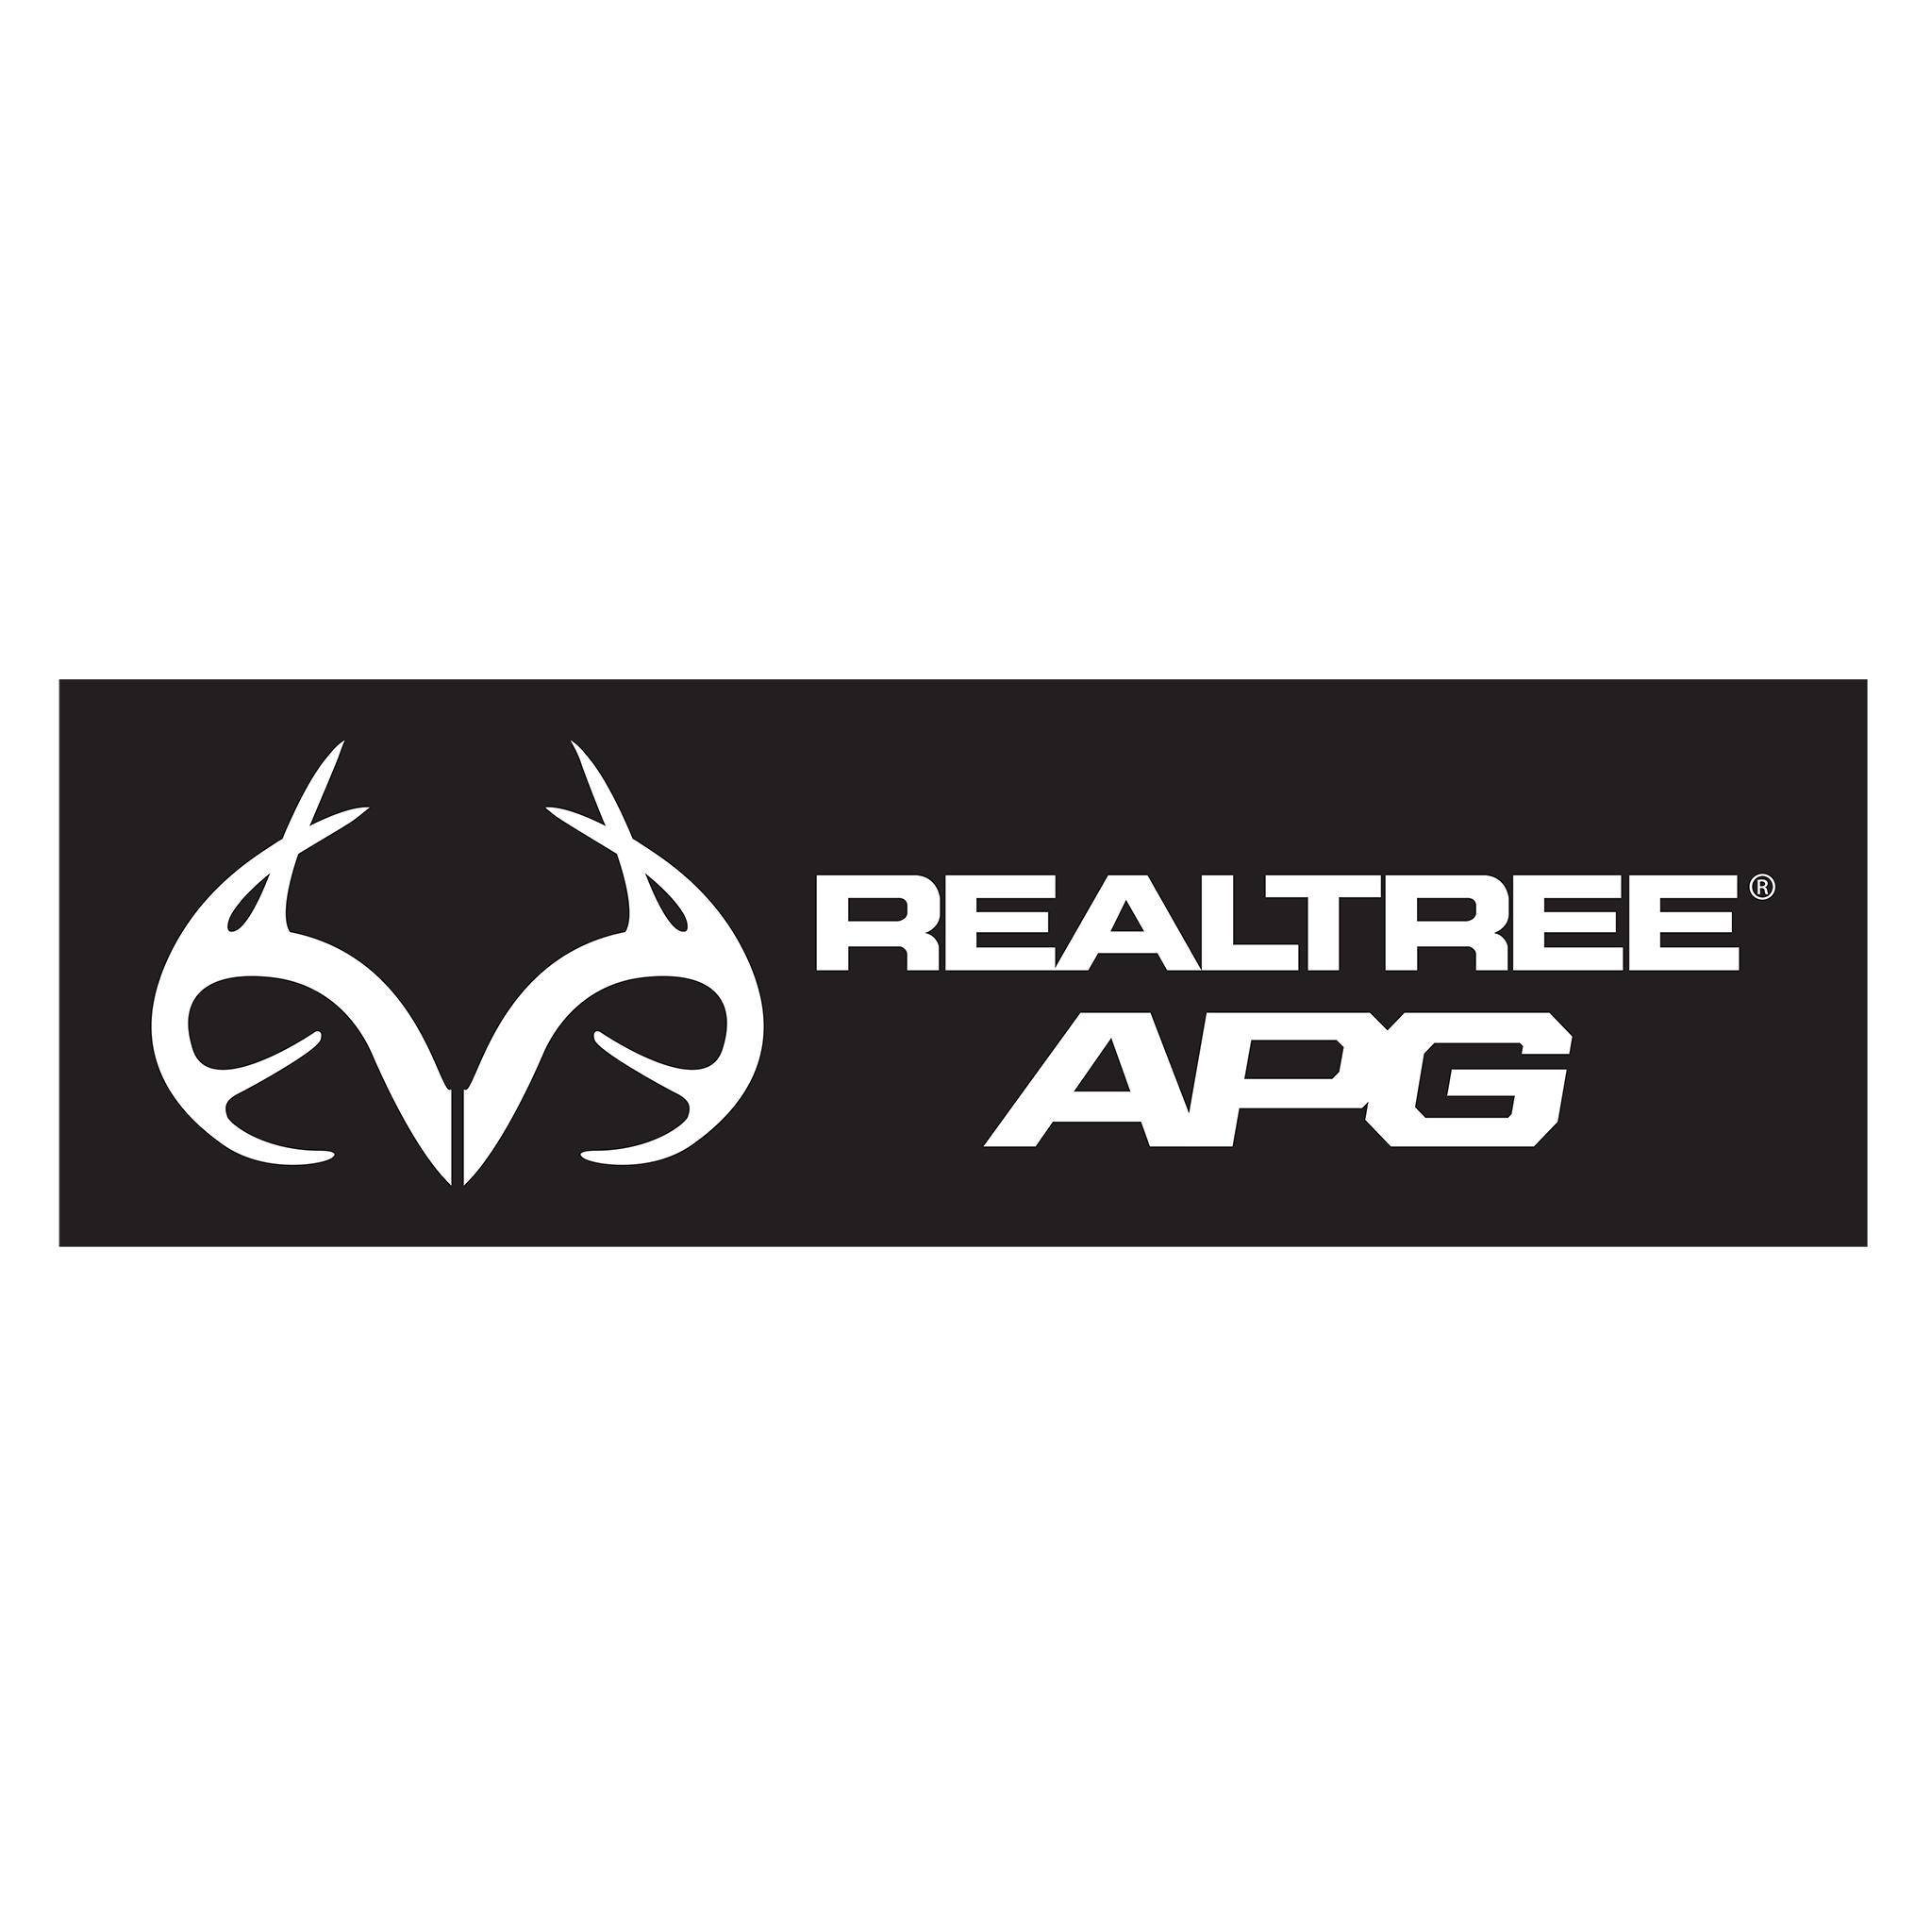 OLP_Realtree_APG_reverse_hztl.jpeg